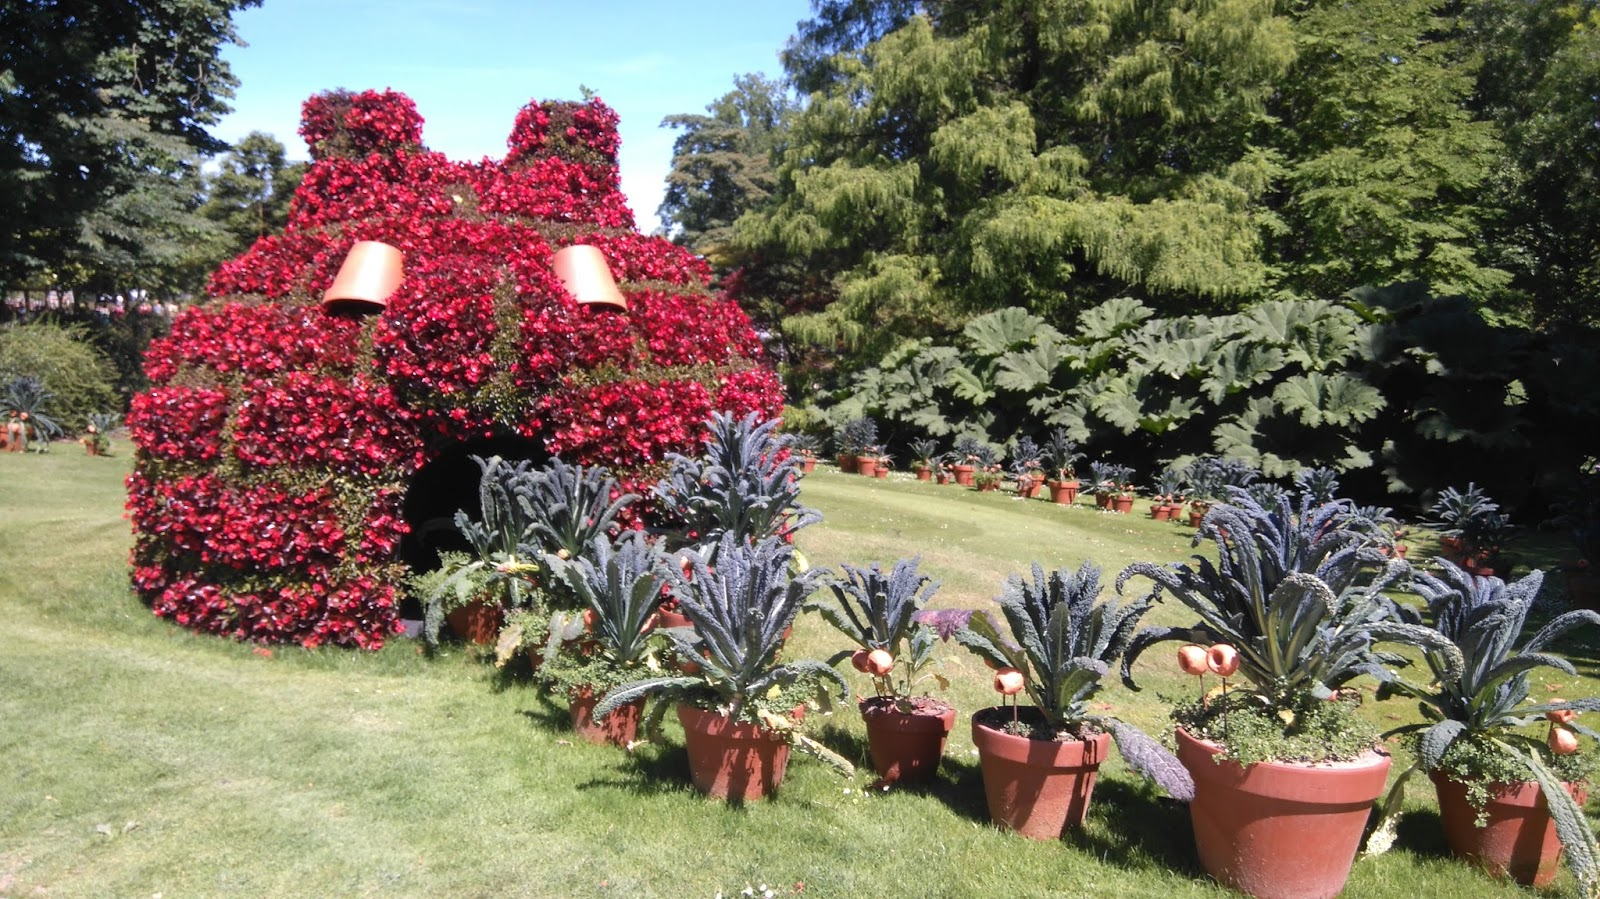 Awesome le jardin des plantes nantes histoire gallery for Jardin des plantes orchidees 2016